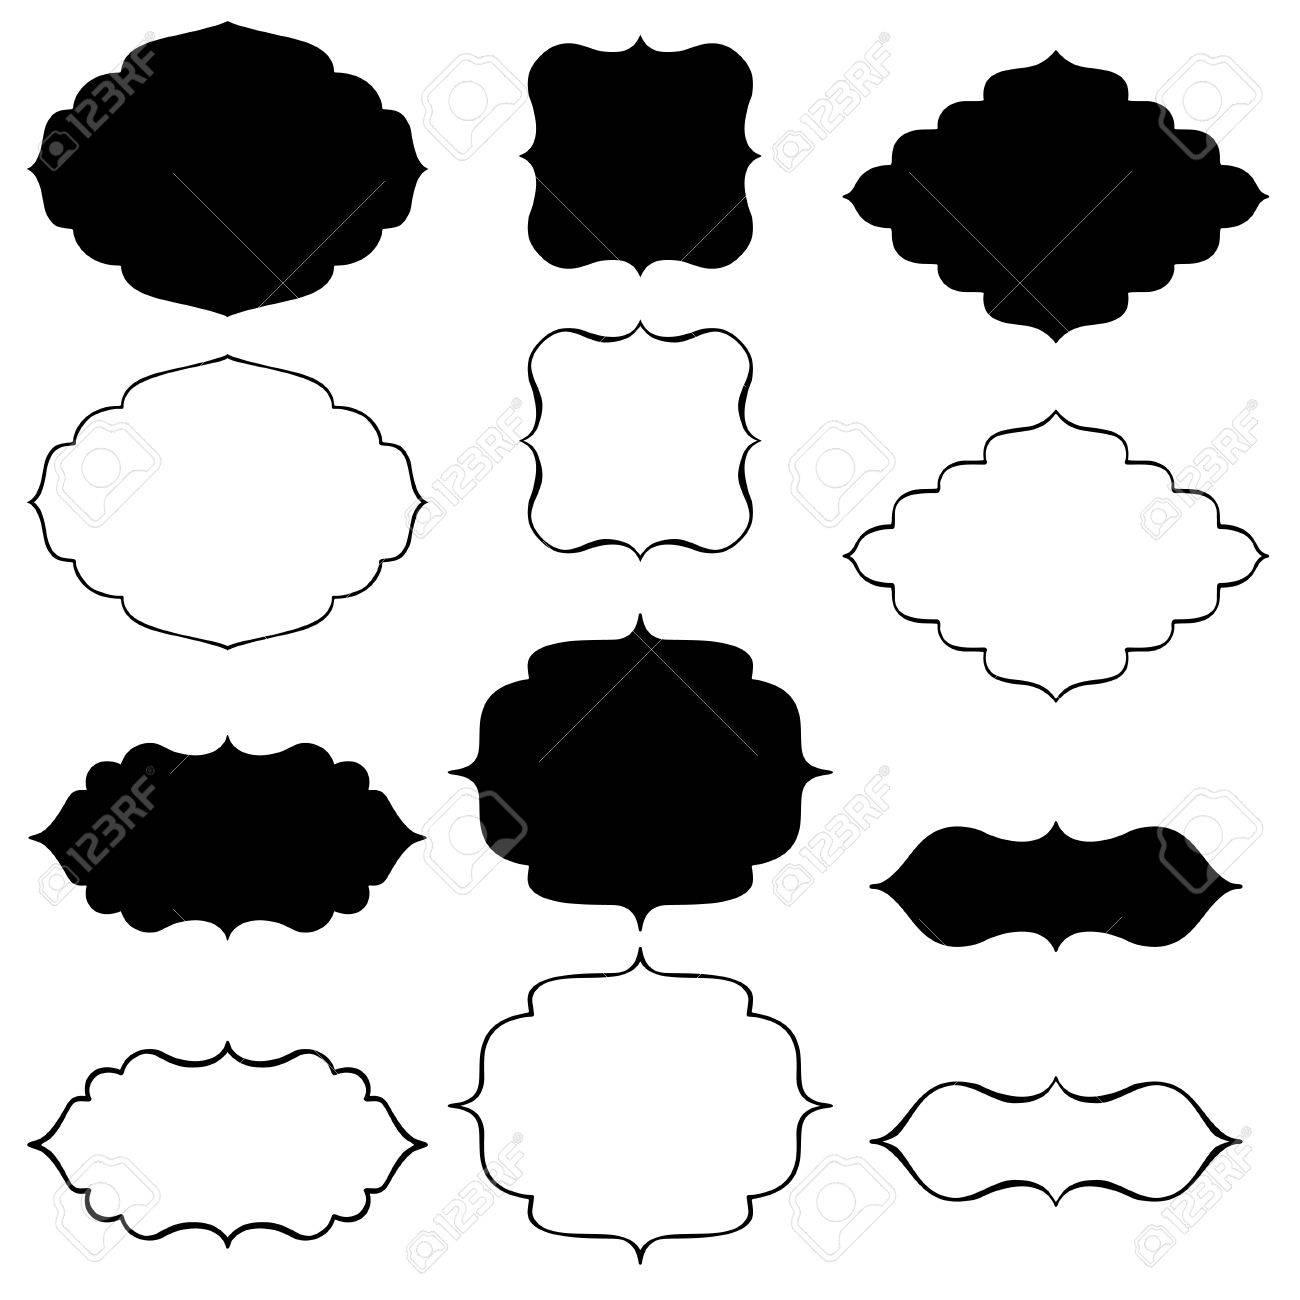 Bracket Black Decorative Frames Royalty Free Cliparts, Vectors, And ...